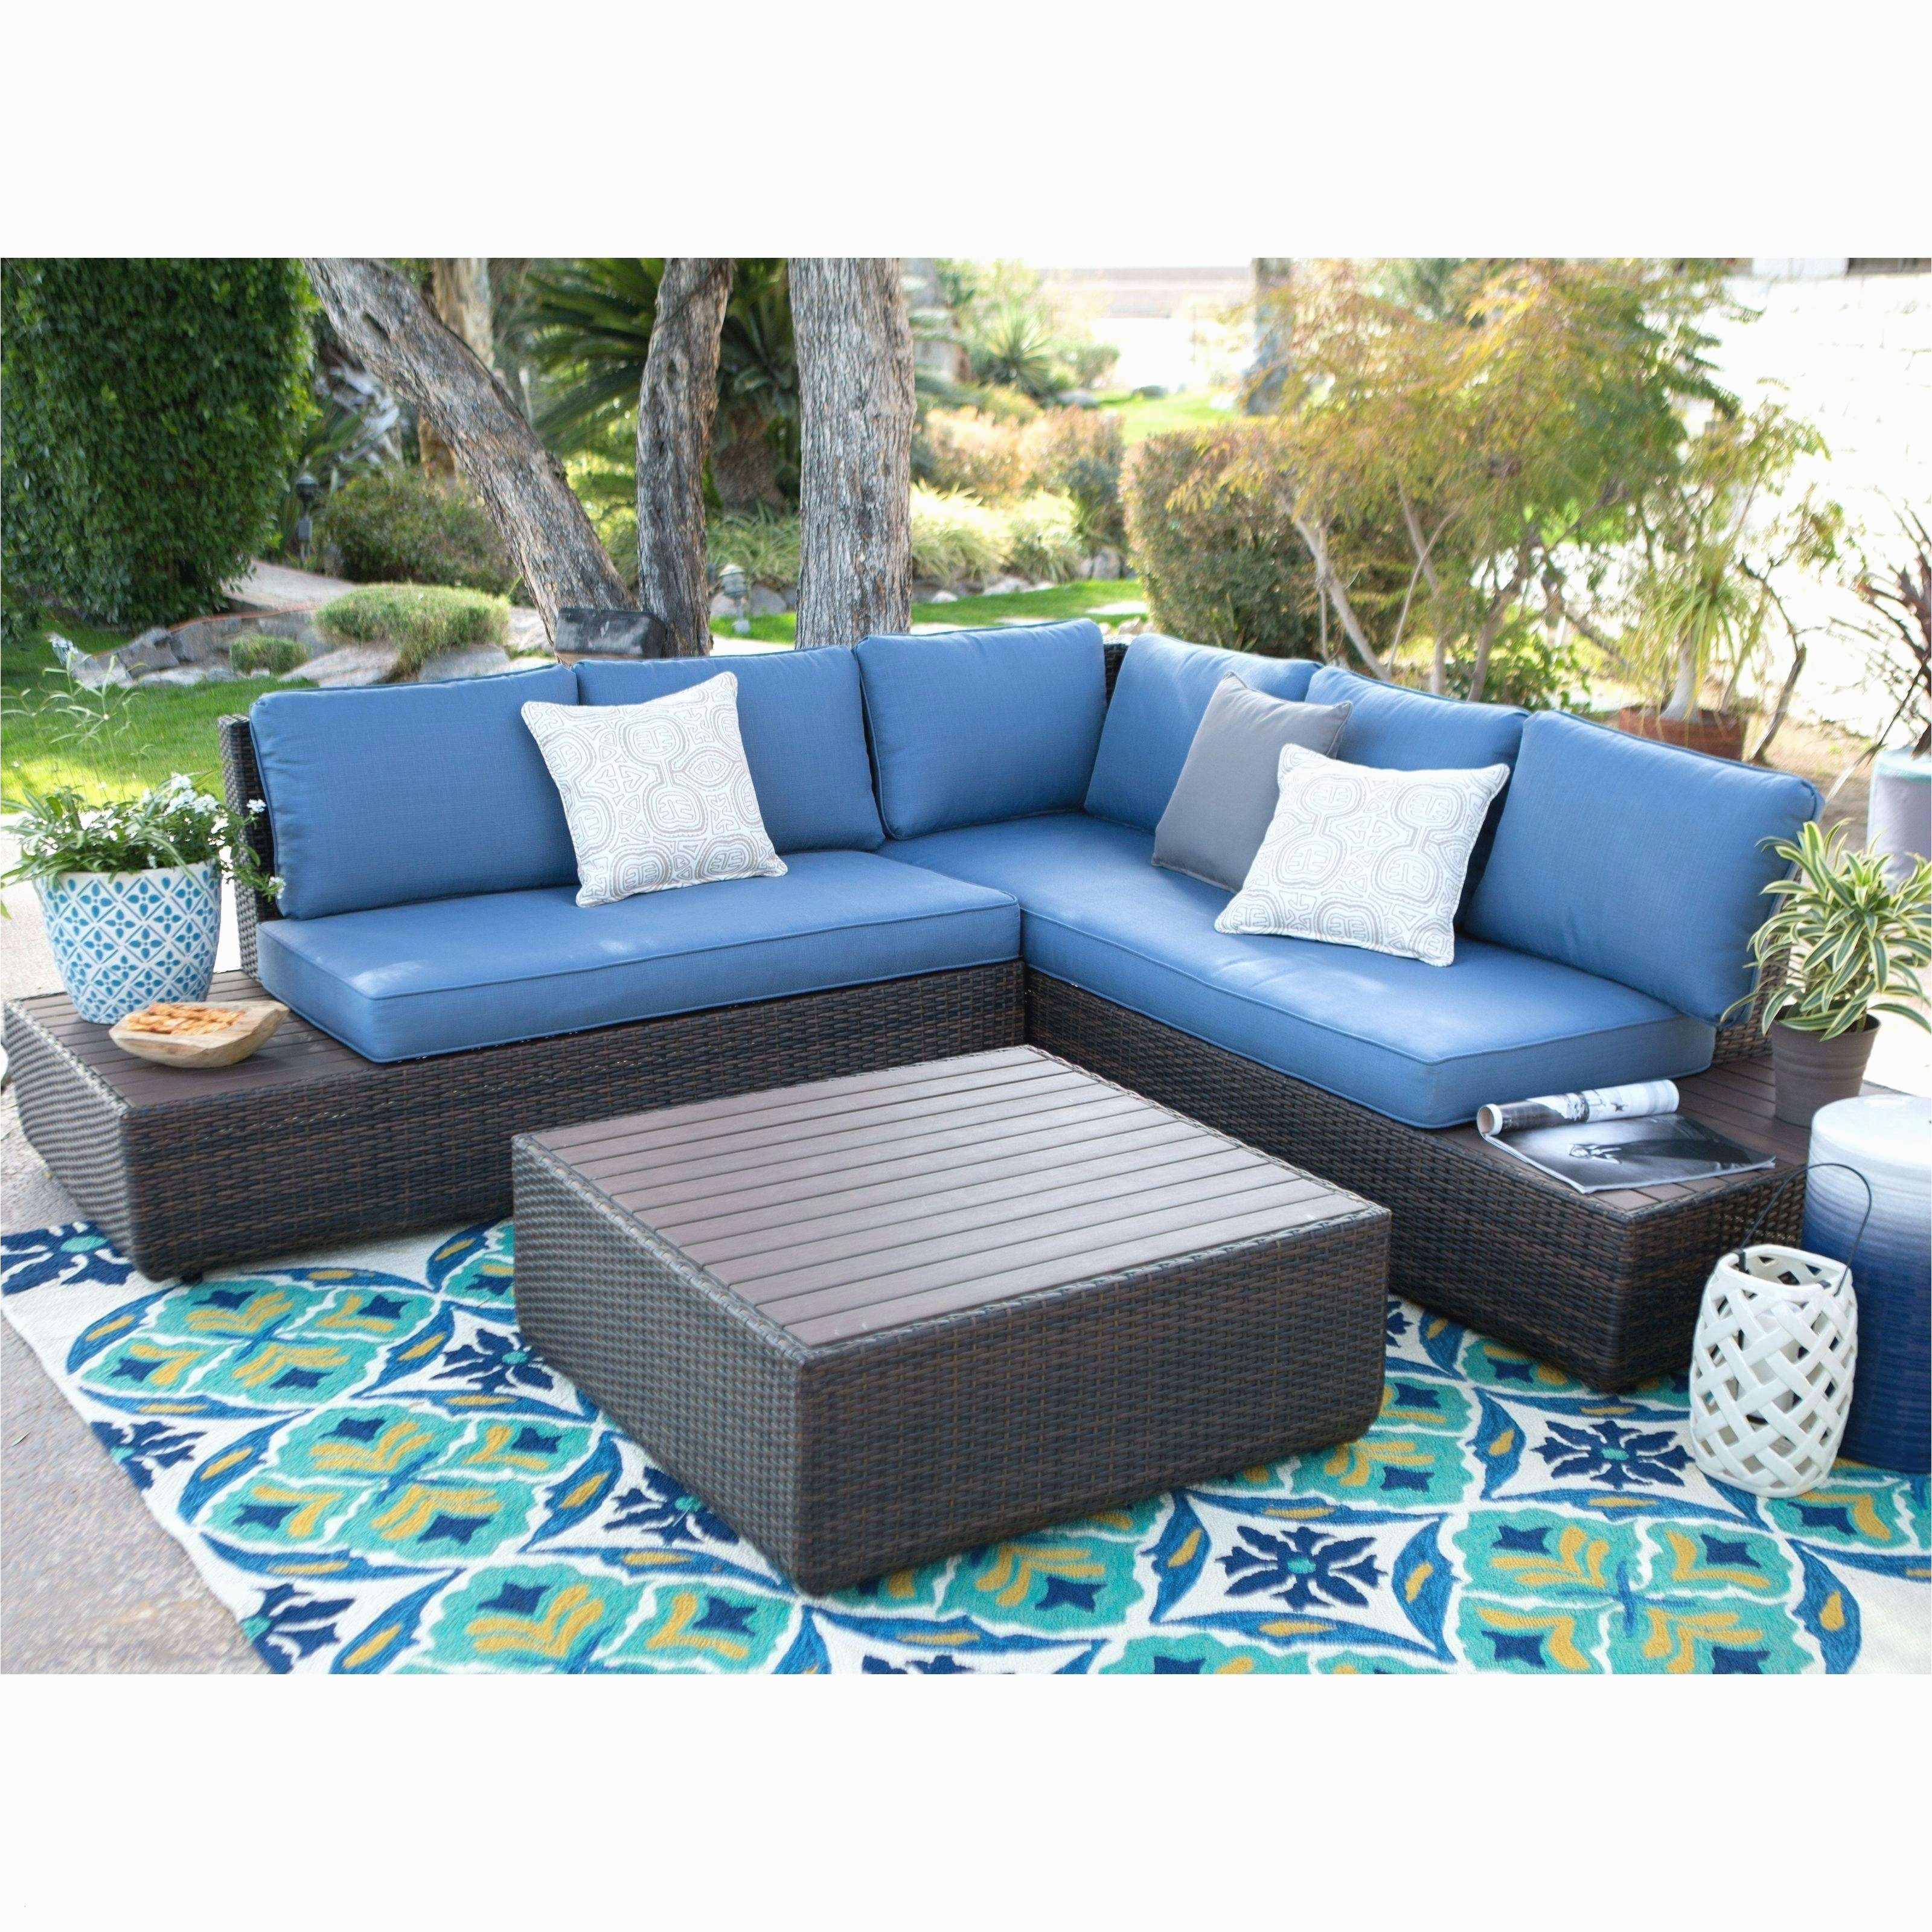 resin wicker outdoor furniture inspirational bett sofa elegant sofa bett innen wicker outdoor sofa 0d patio